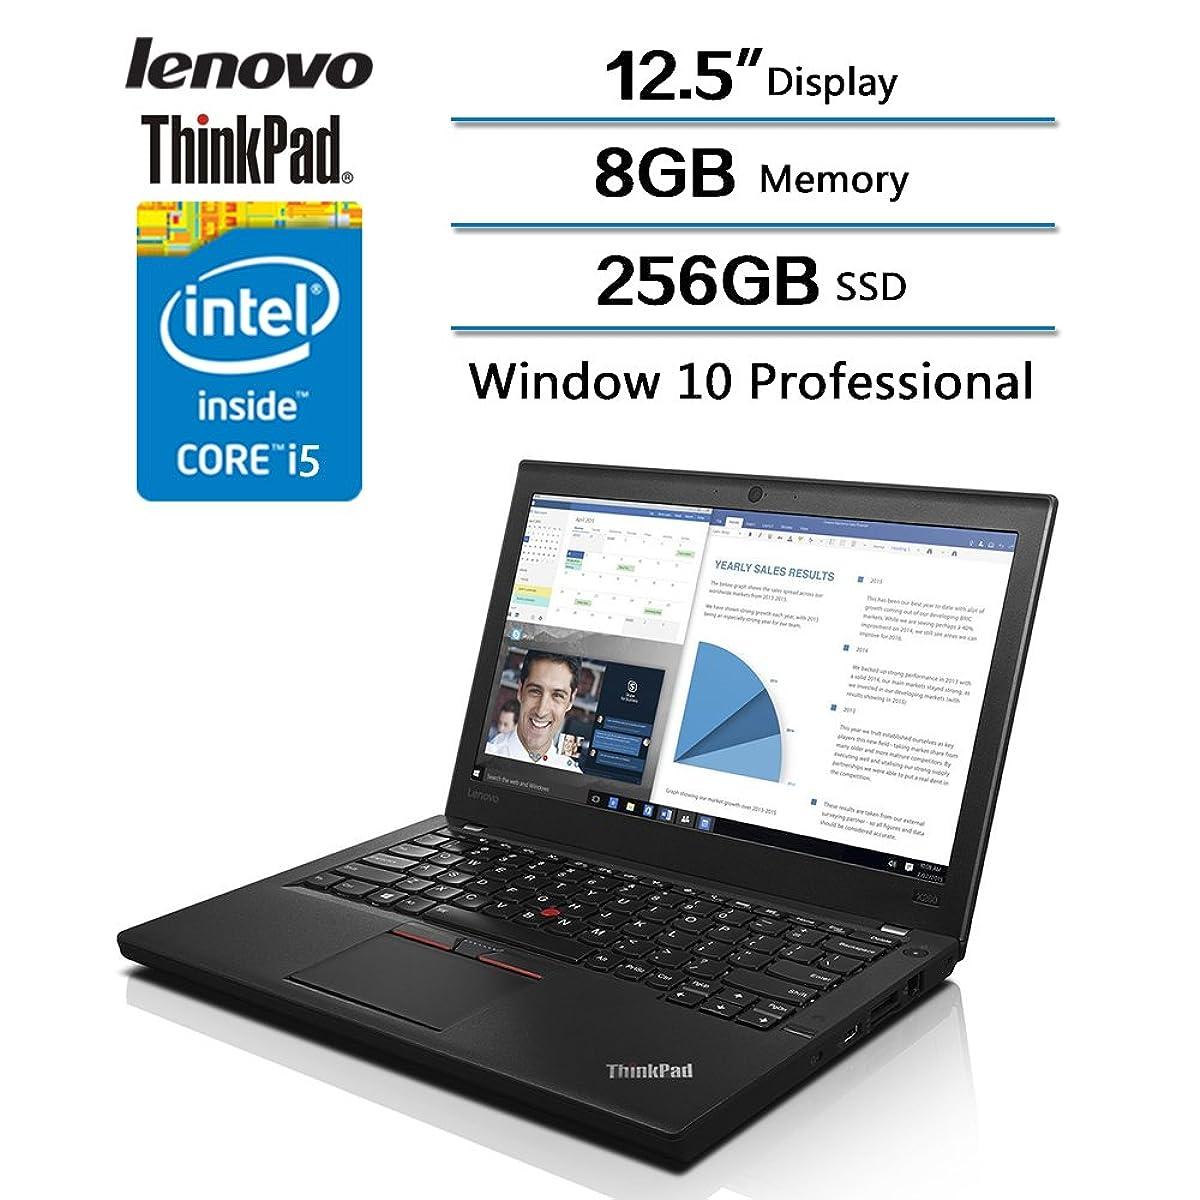 Lenovo ThinkPad X260 Business Laptop-12.5